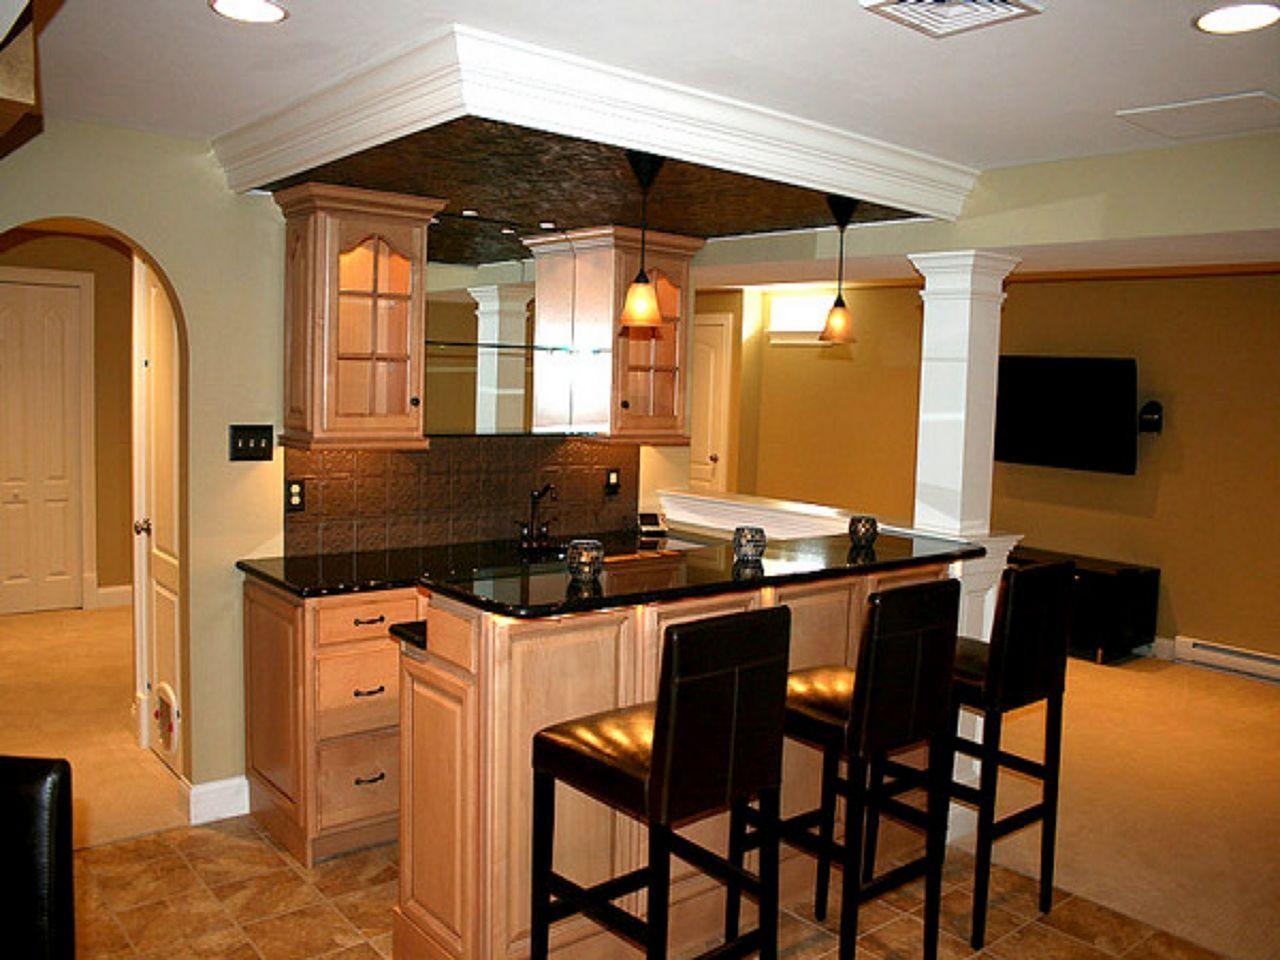 Breathtaking Wonderful 25 Small Kitchen Bar Design Ideas For Your Home Https Bosidolot Com 201 Small Basement Kitchen Kitchen Design Plans Kitchen Bar Design